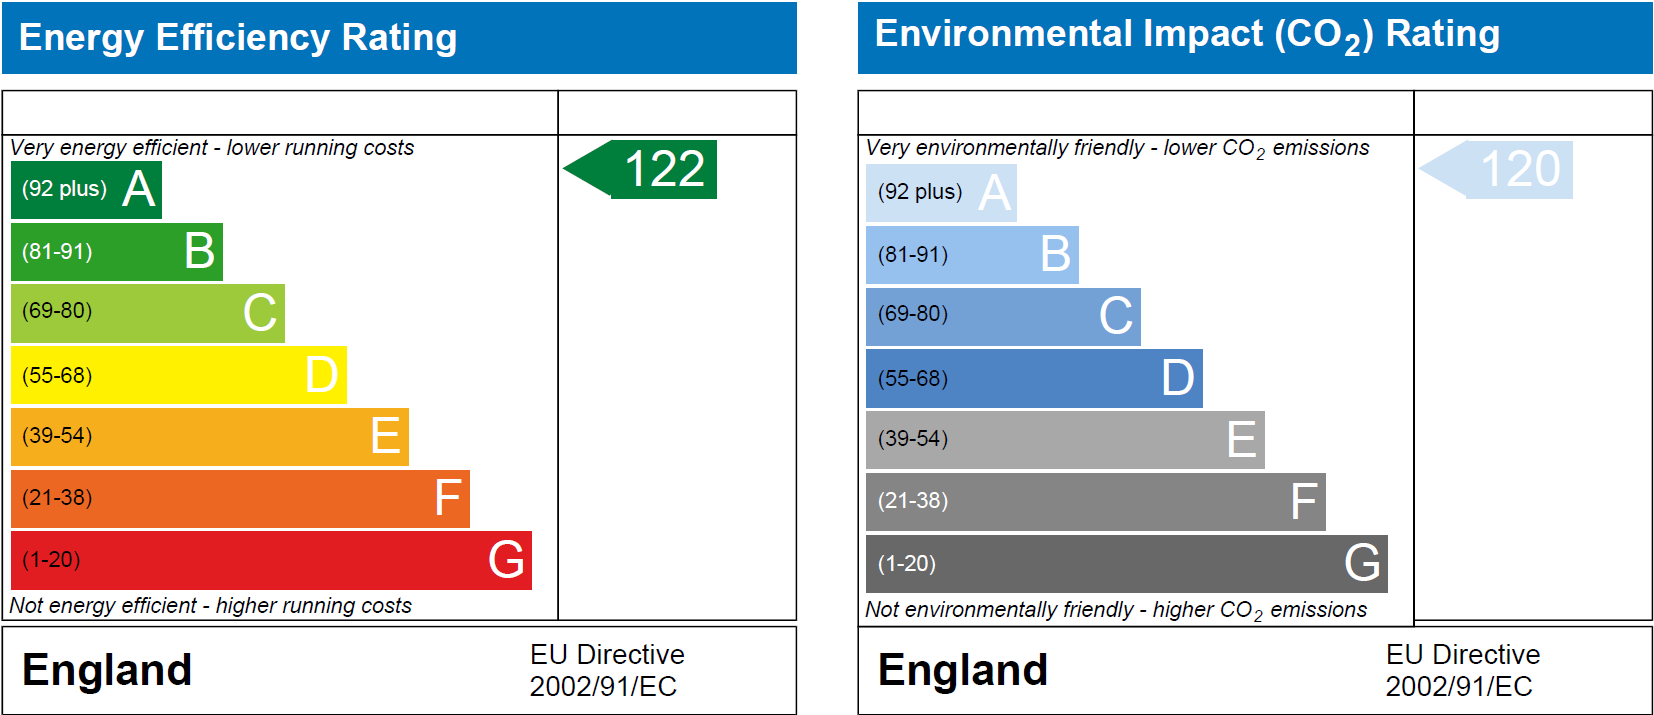 Sap Calculation Spreadsheet Pertaining To Sap Calculations  Building Regulations  Buildhub.uk